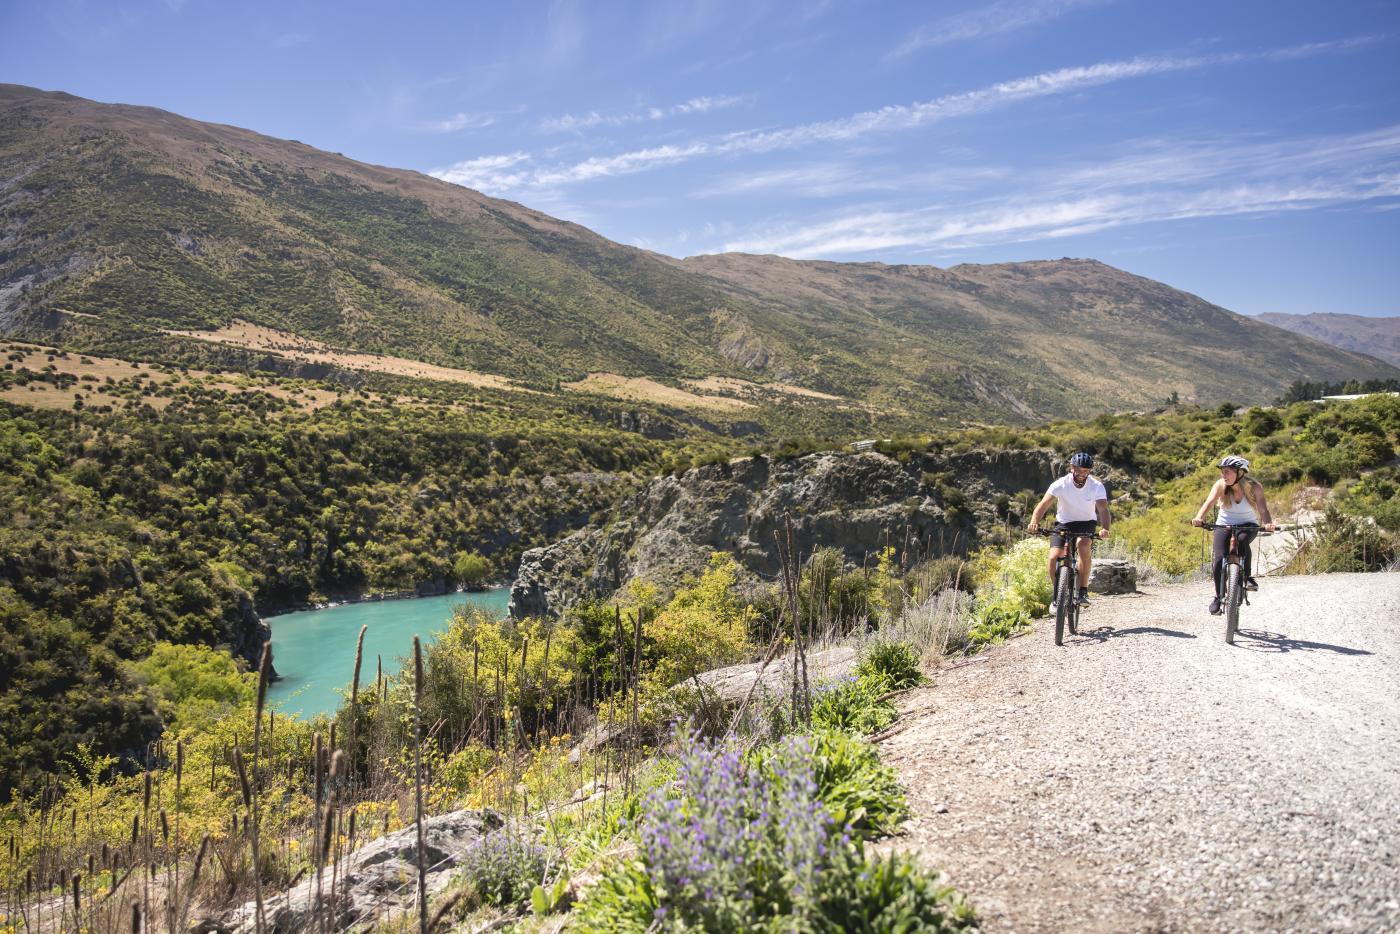 Biking alongside the Kawarau River, on the Gibbston River Trail